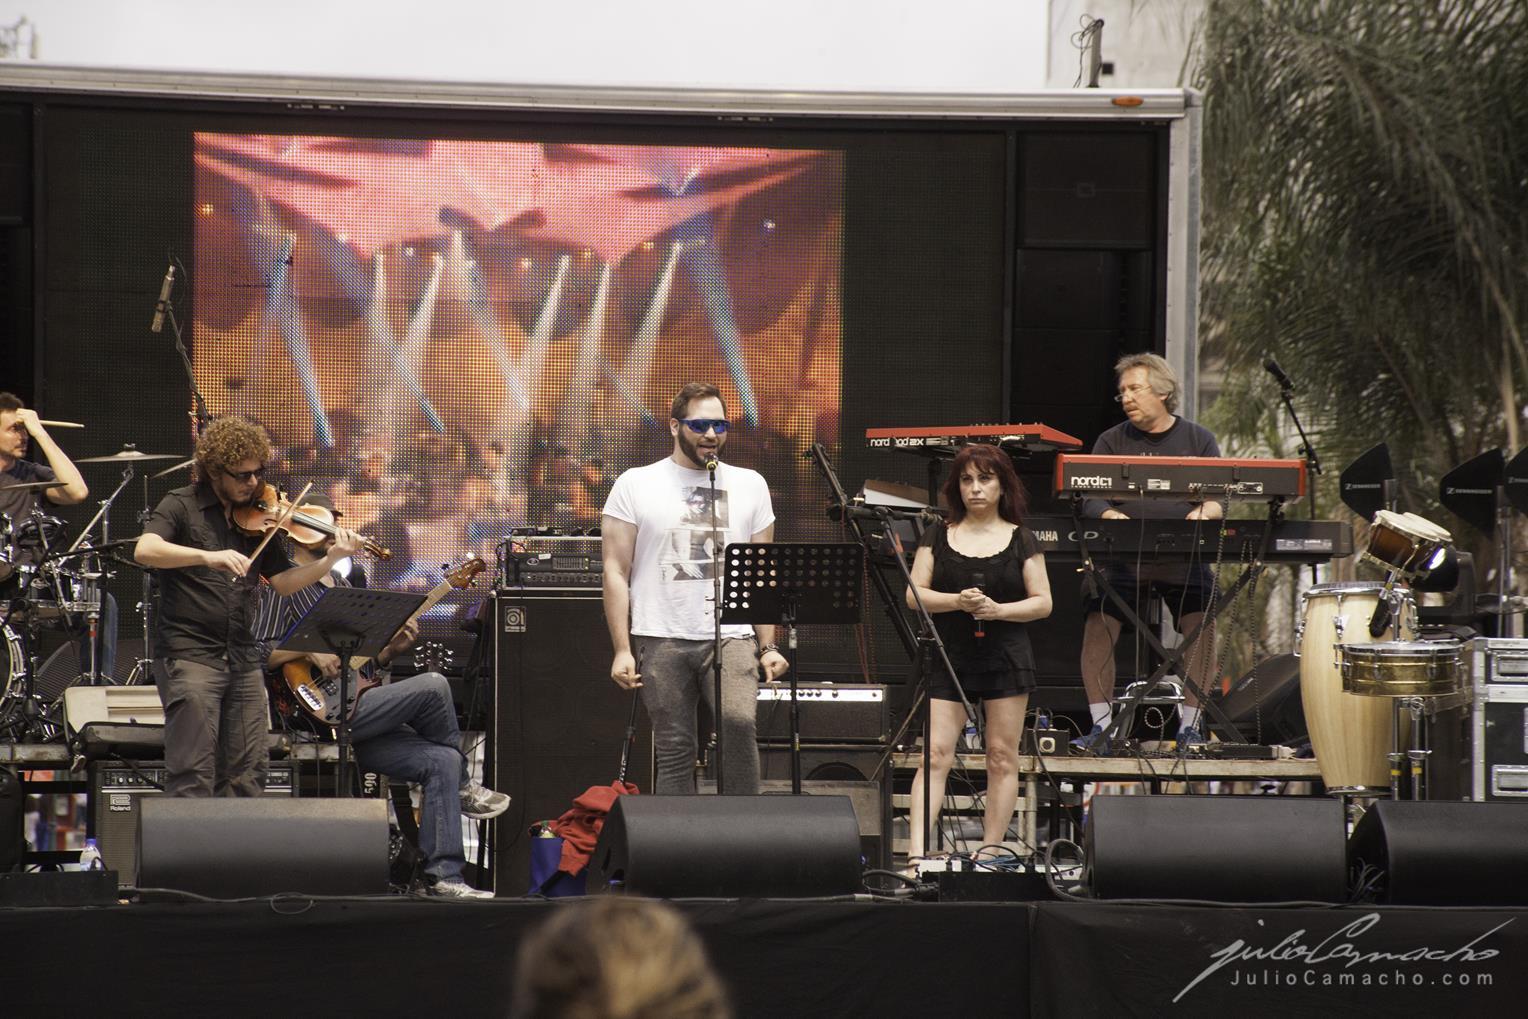 2014-10-30 31 CAST TOUR Ensenada y Tijuana - 1209 - www.Juli (Copy).jpg